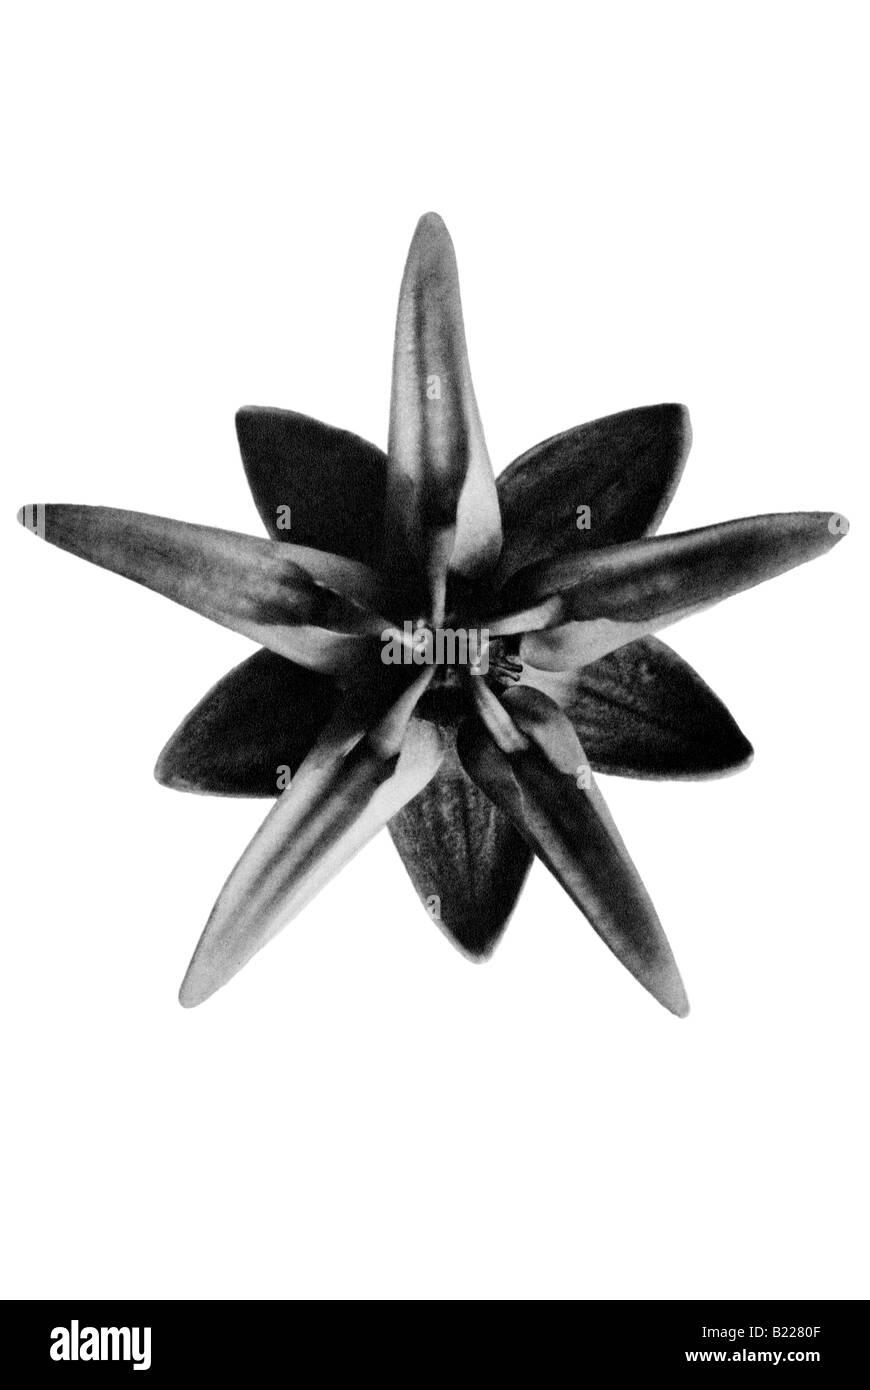 Silkweed Archetypes of Art Karl Blossfeldt Urformen der Kunst Stock Photo